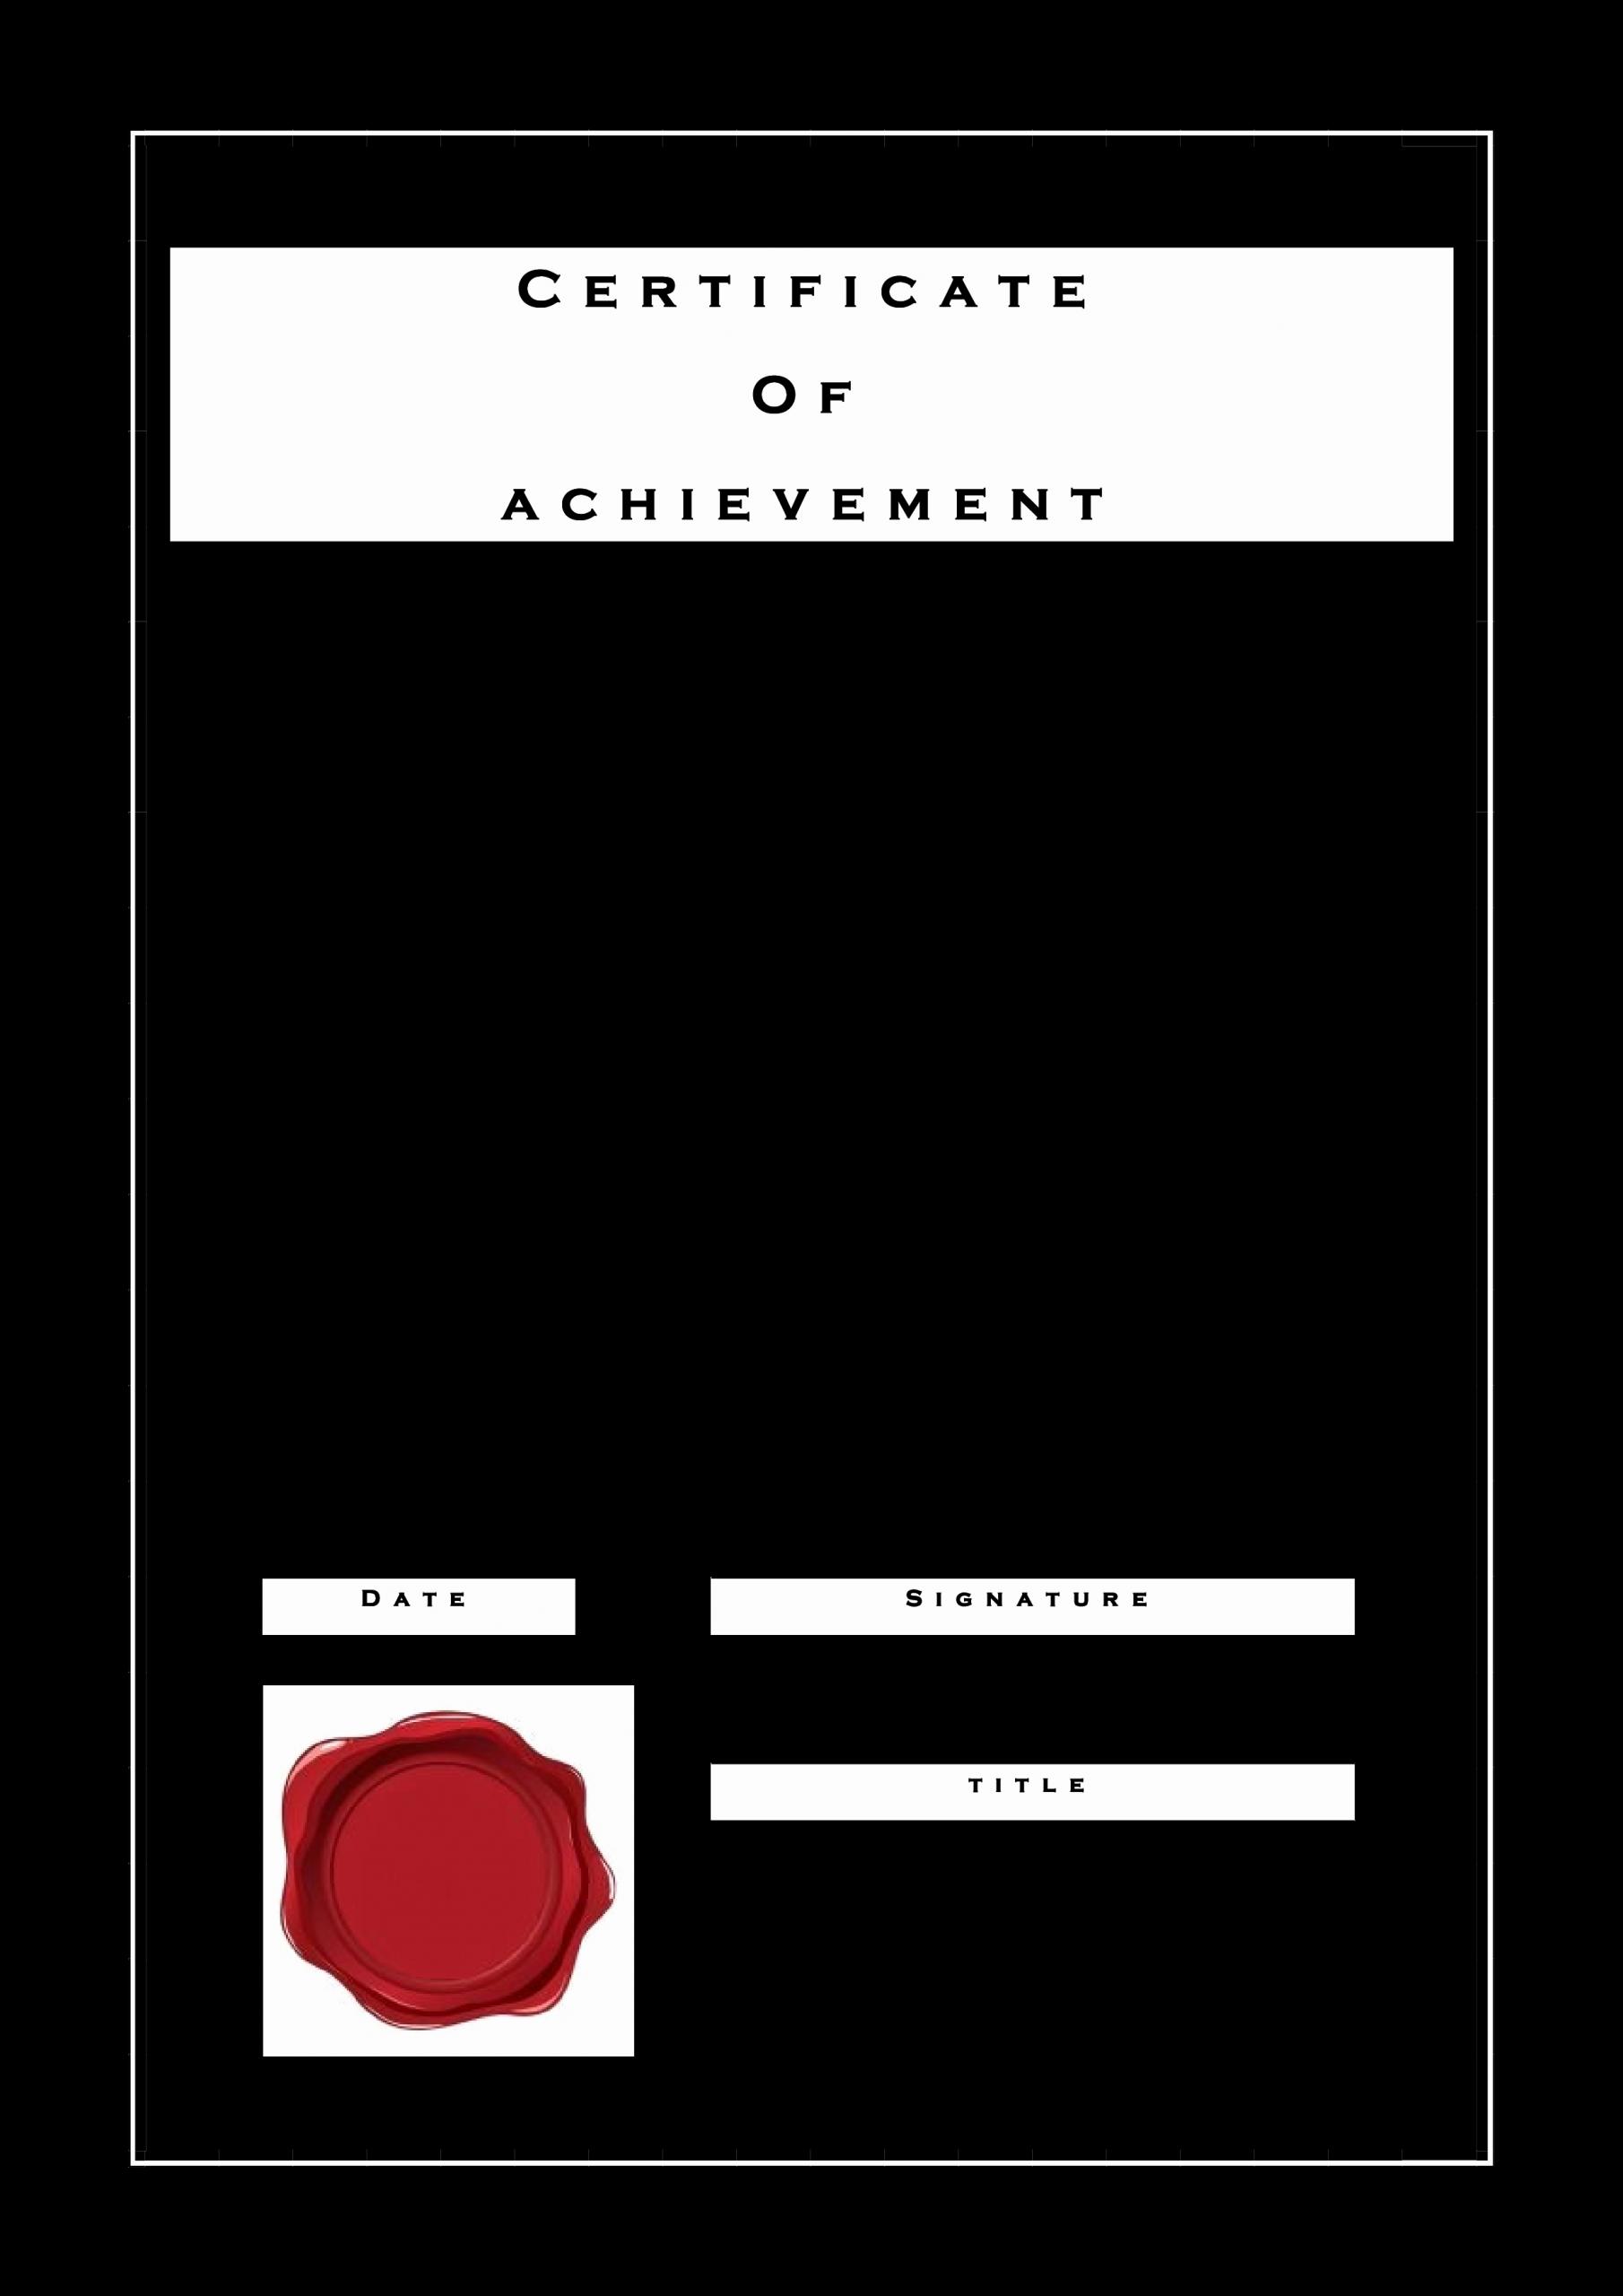 Junior Achievement Certificate Template Best Of 免费 Certificate Achievement formal Style